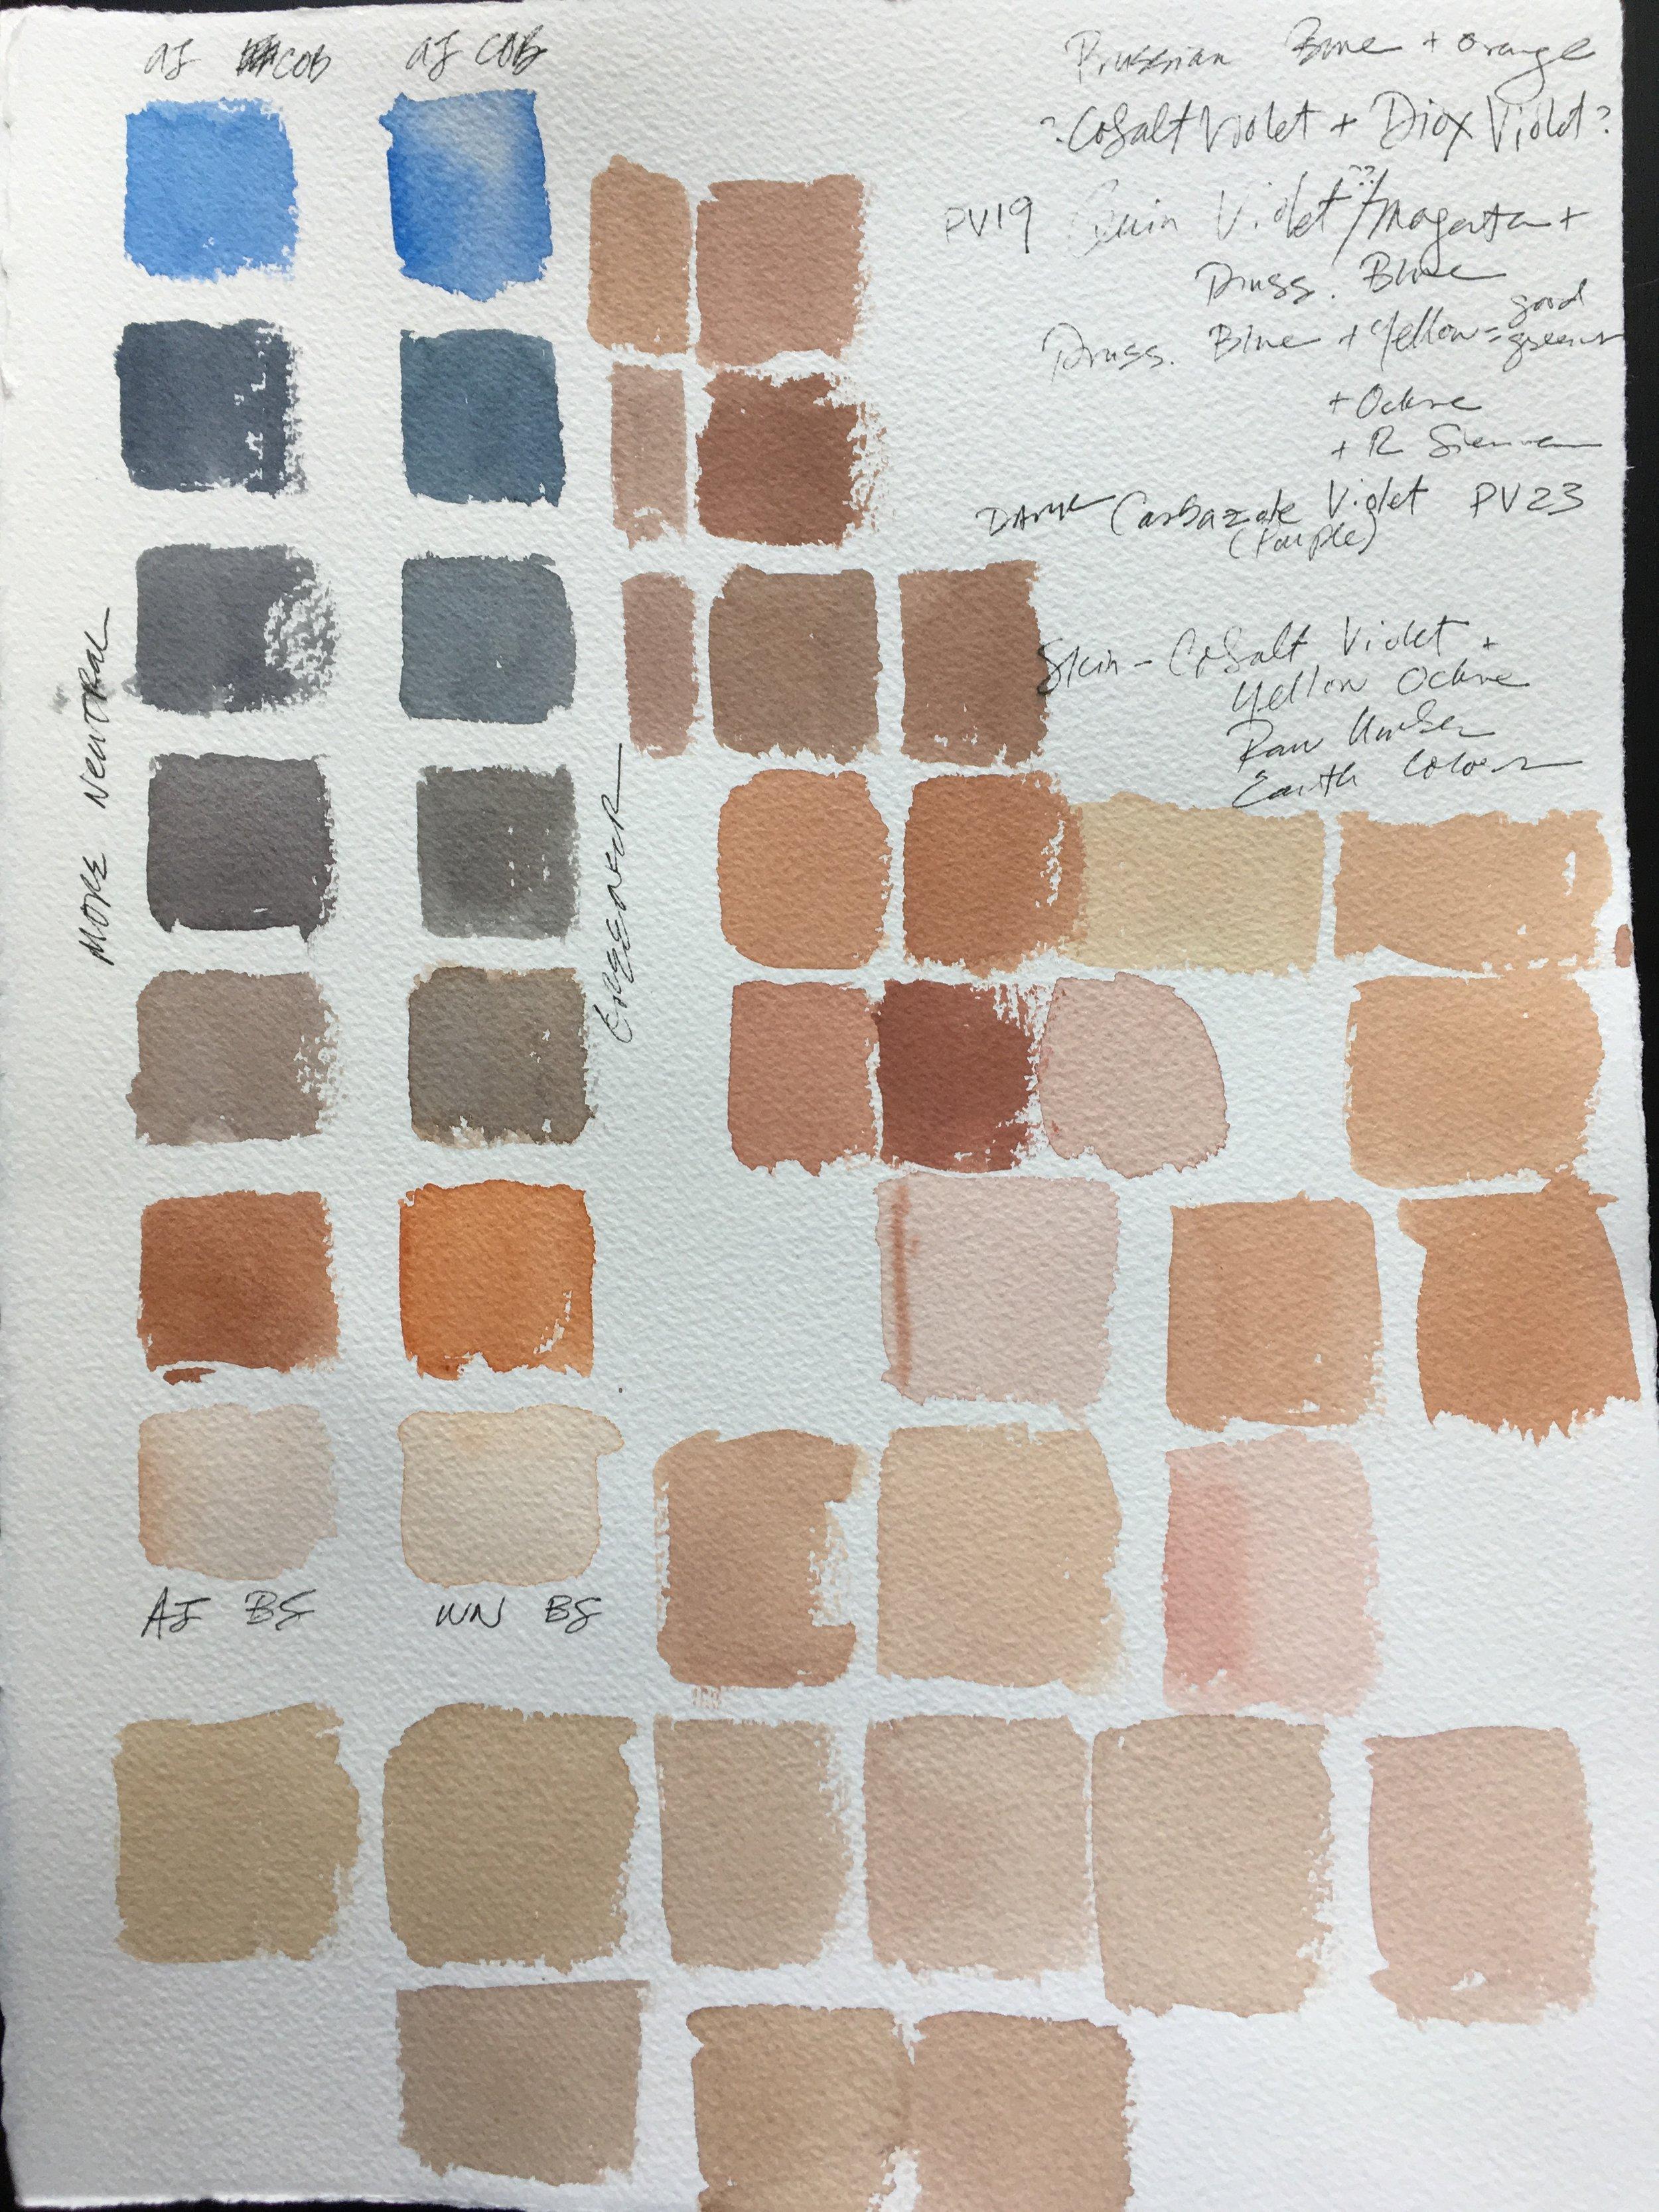 Oil Paint Skin Tones : paint, tones, Exploring, Tones, Seamless, Expression